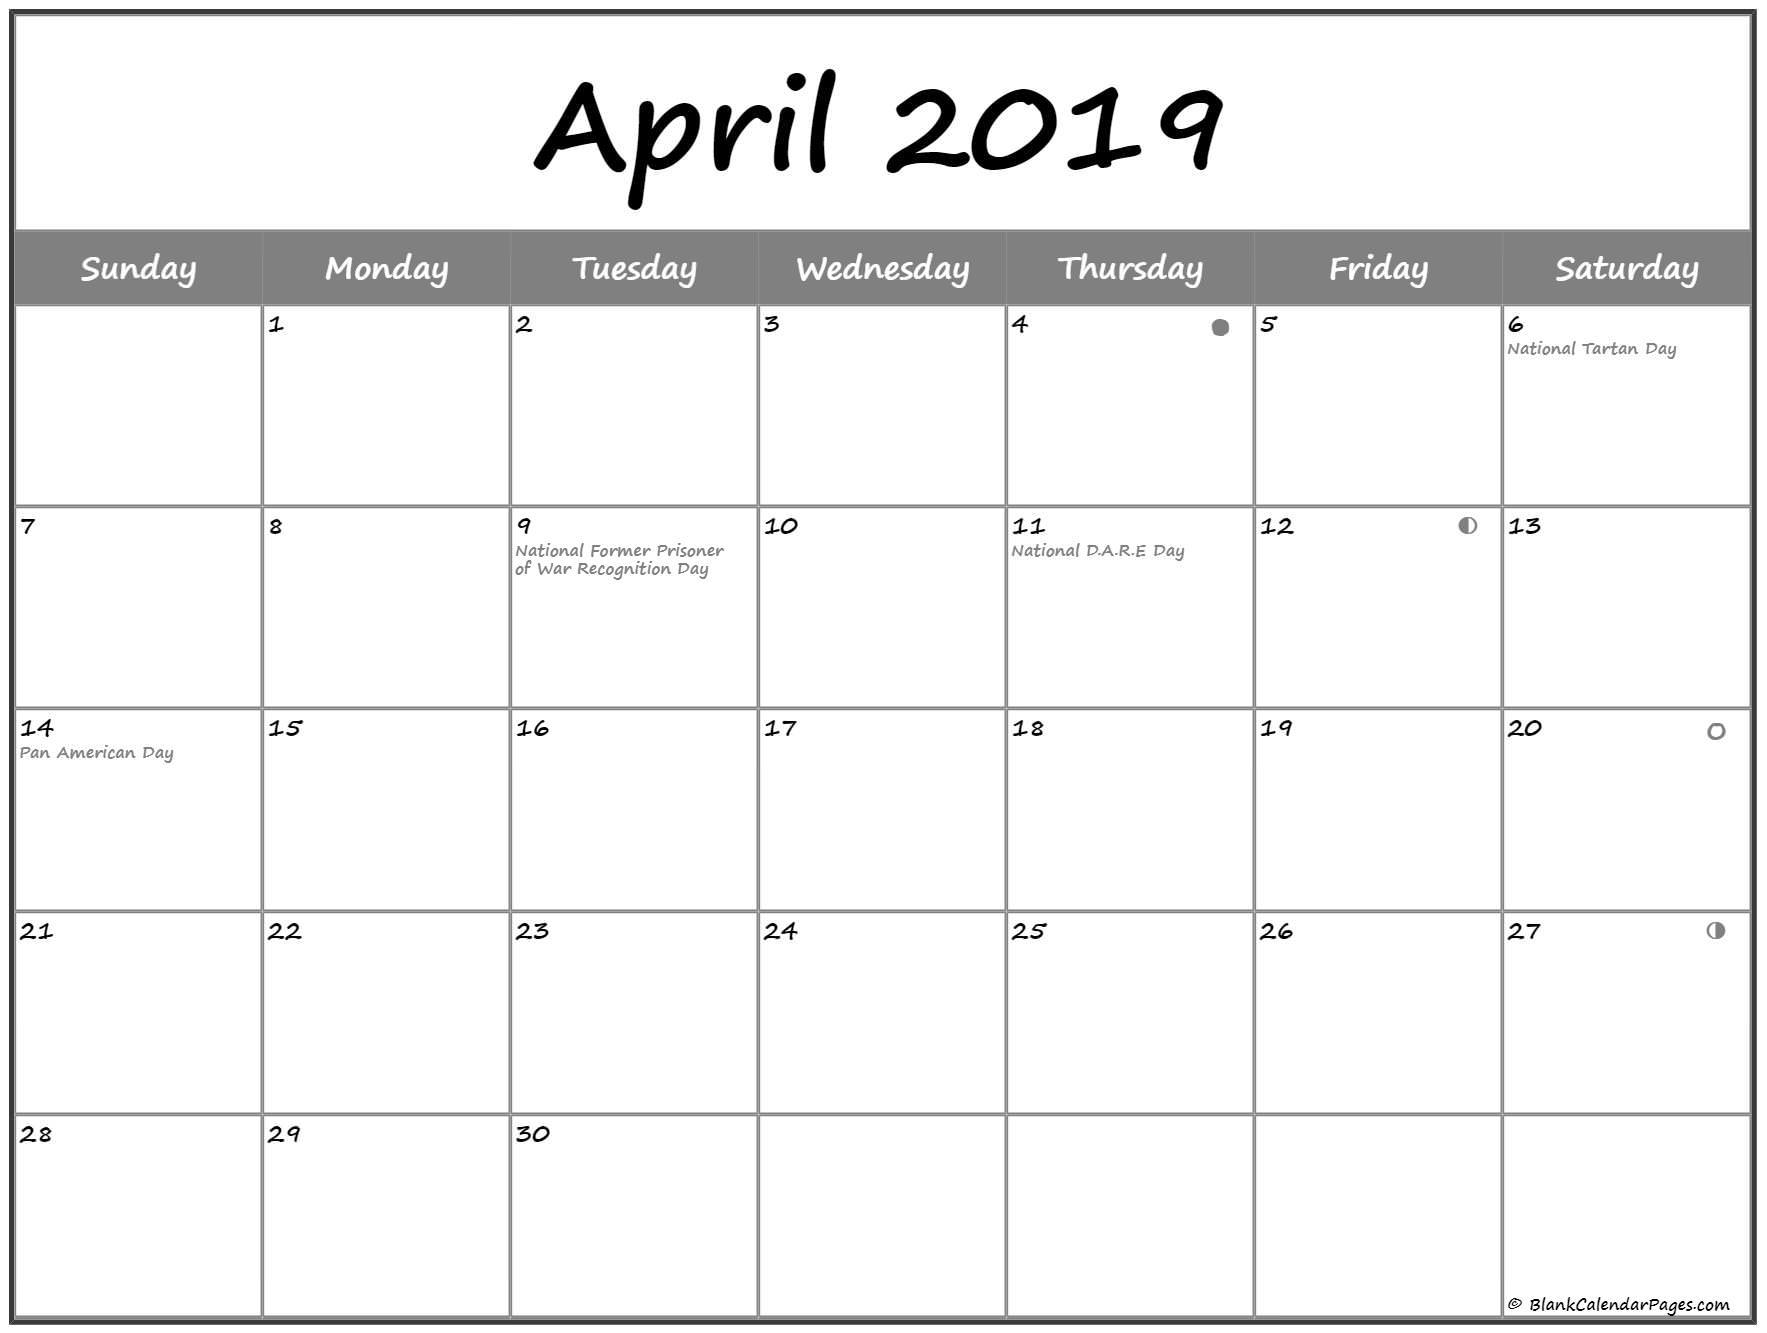 April 2019 USA Calendar With Holidays